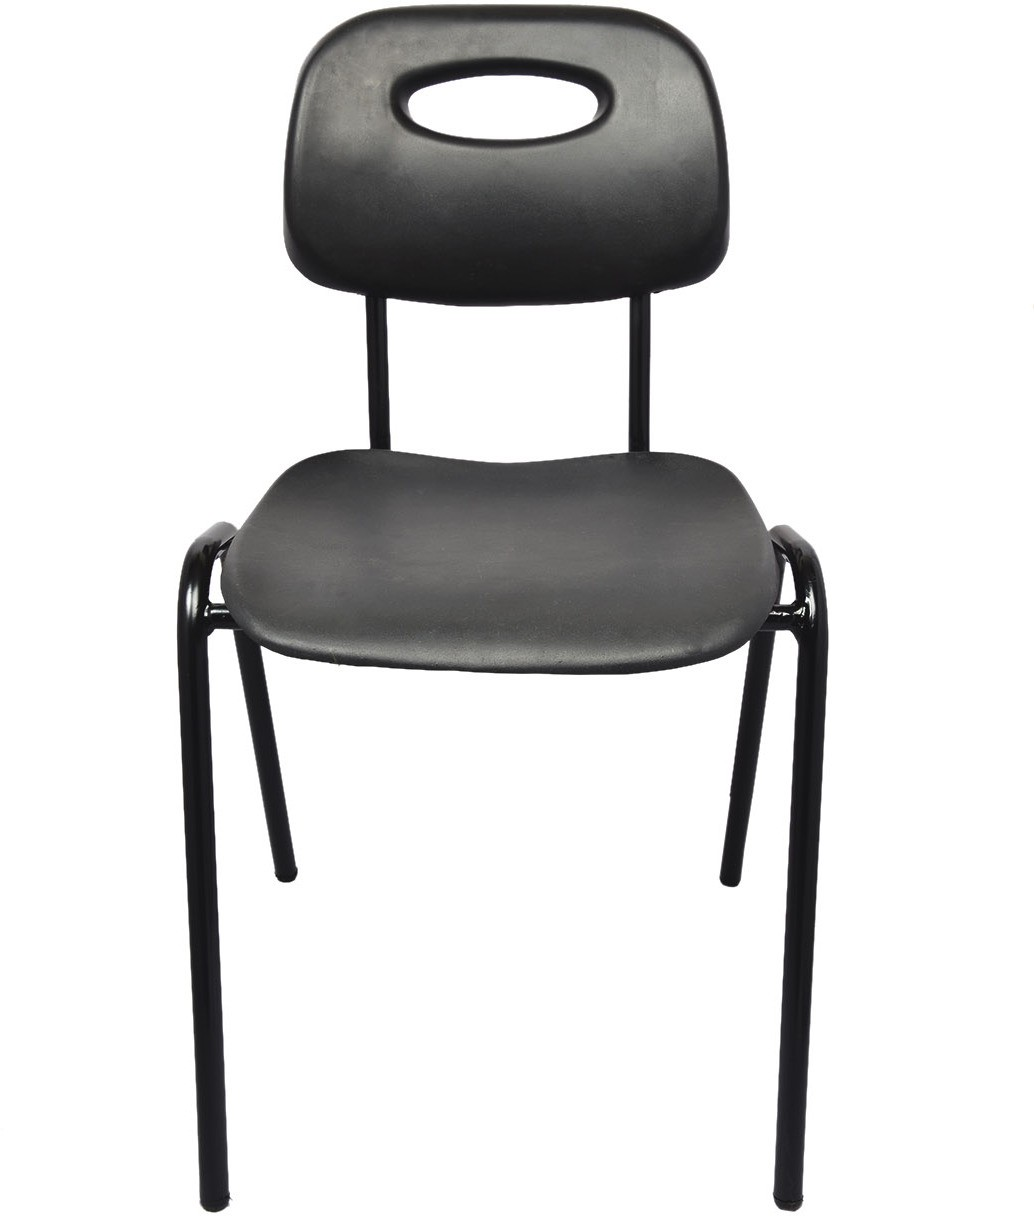 View Darla Interiors Plastic Visitor Chair(Black) Furniture (Darla Interiors)